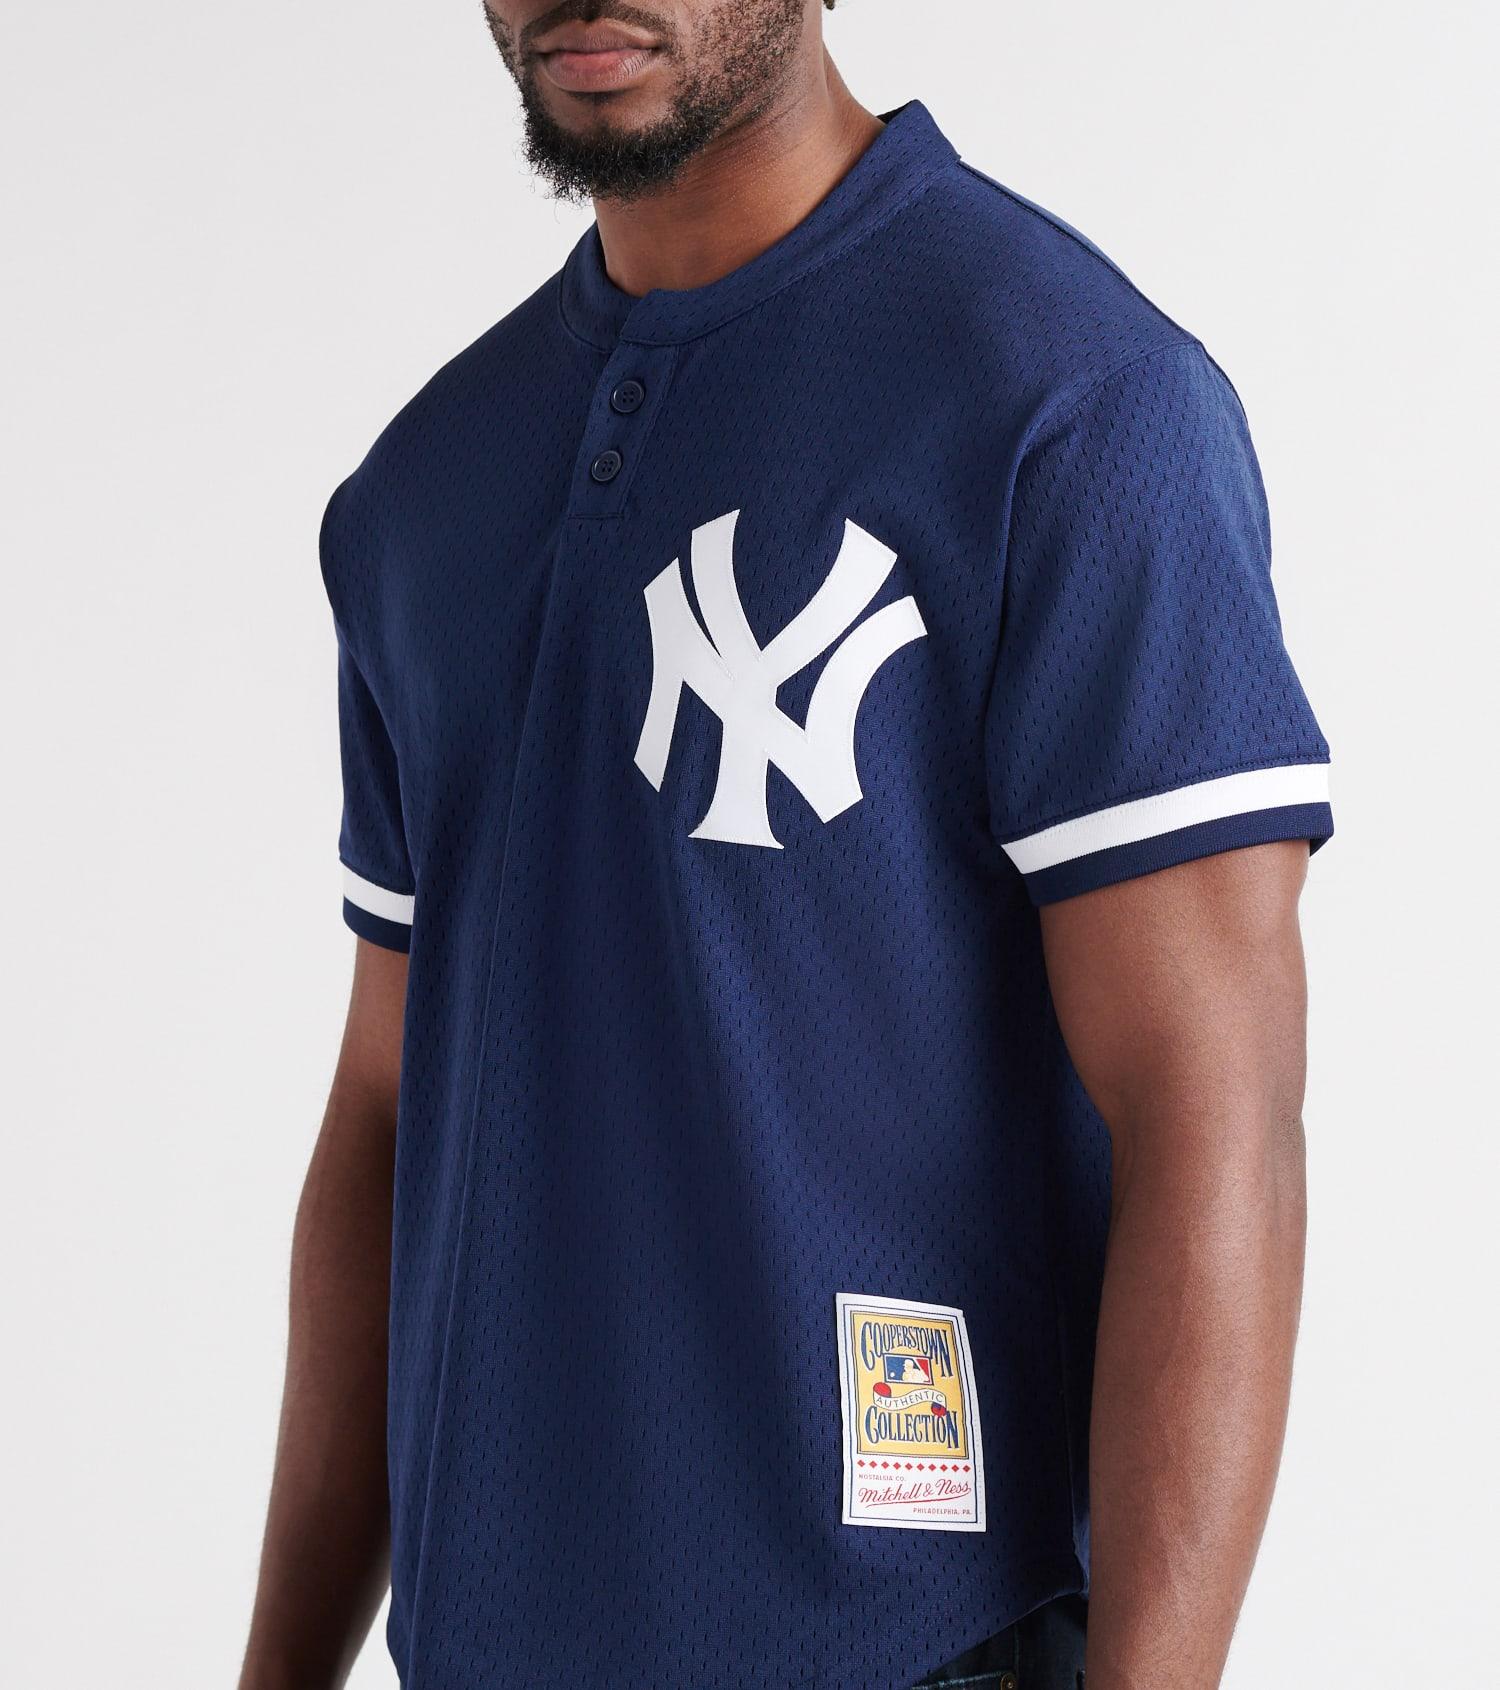 watch 00bd0 16bed Bernie Williams 1995 Yankees BP Jersey